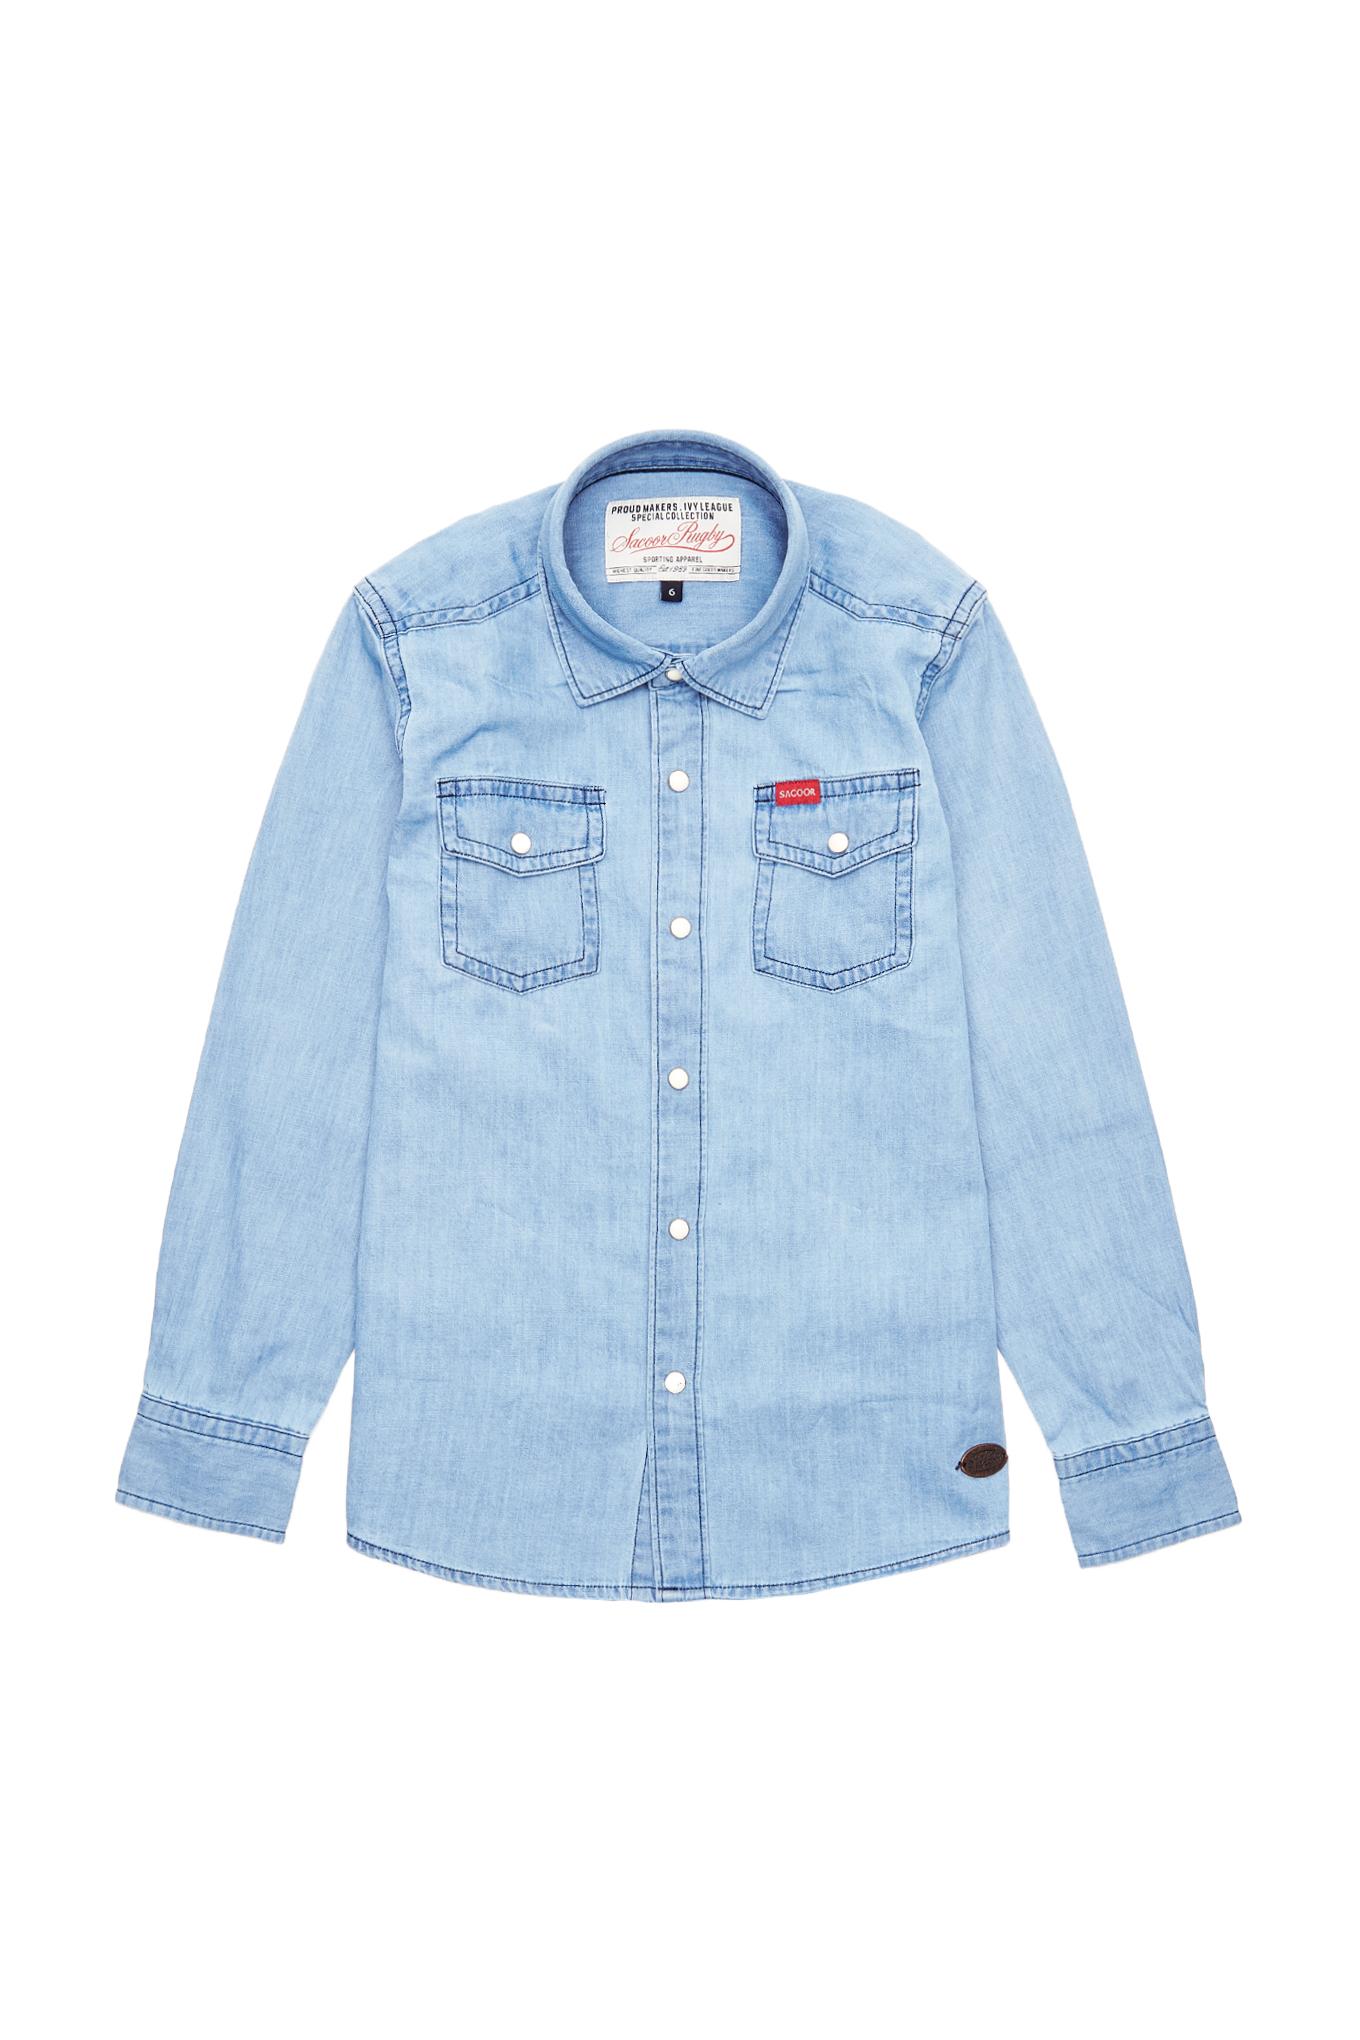 Camisa Azul Claro Sport Rapaz